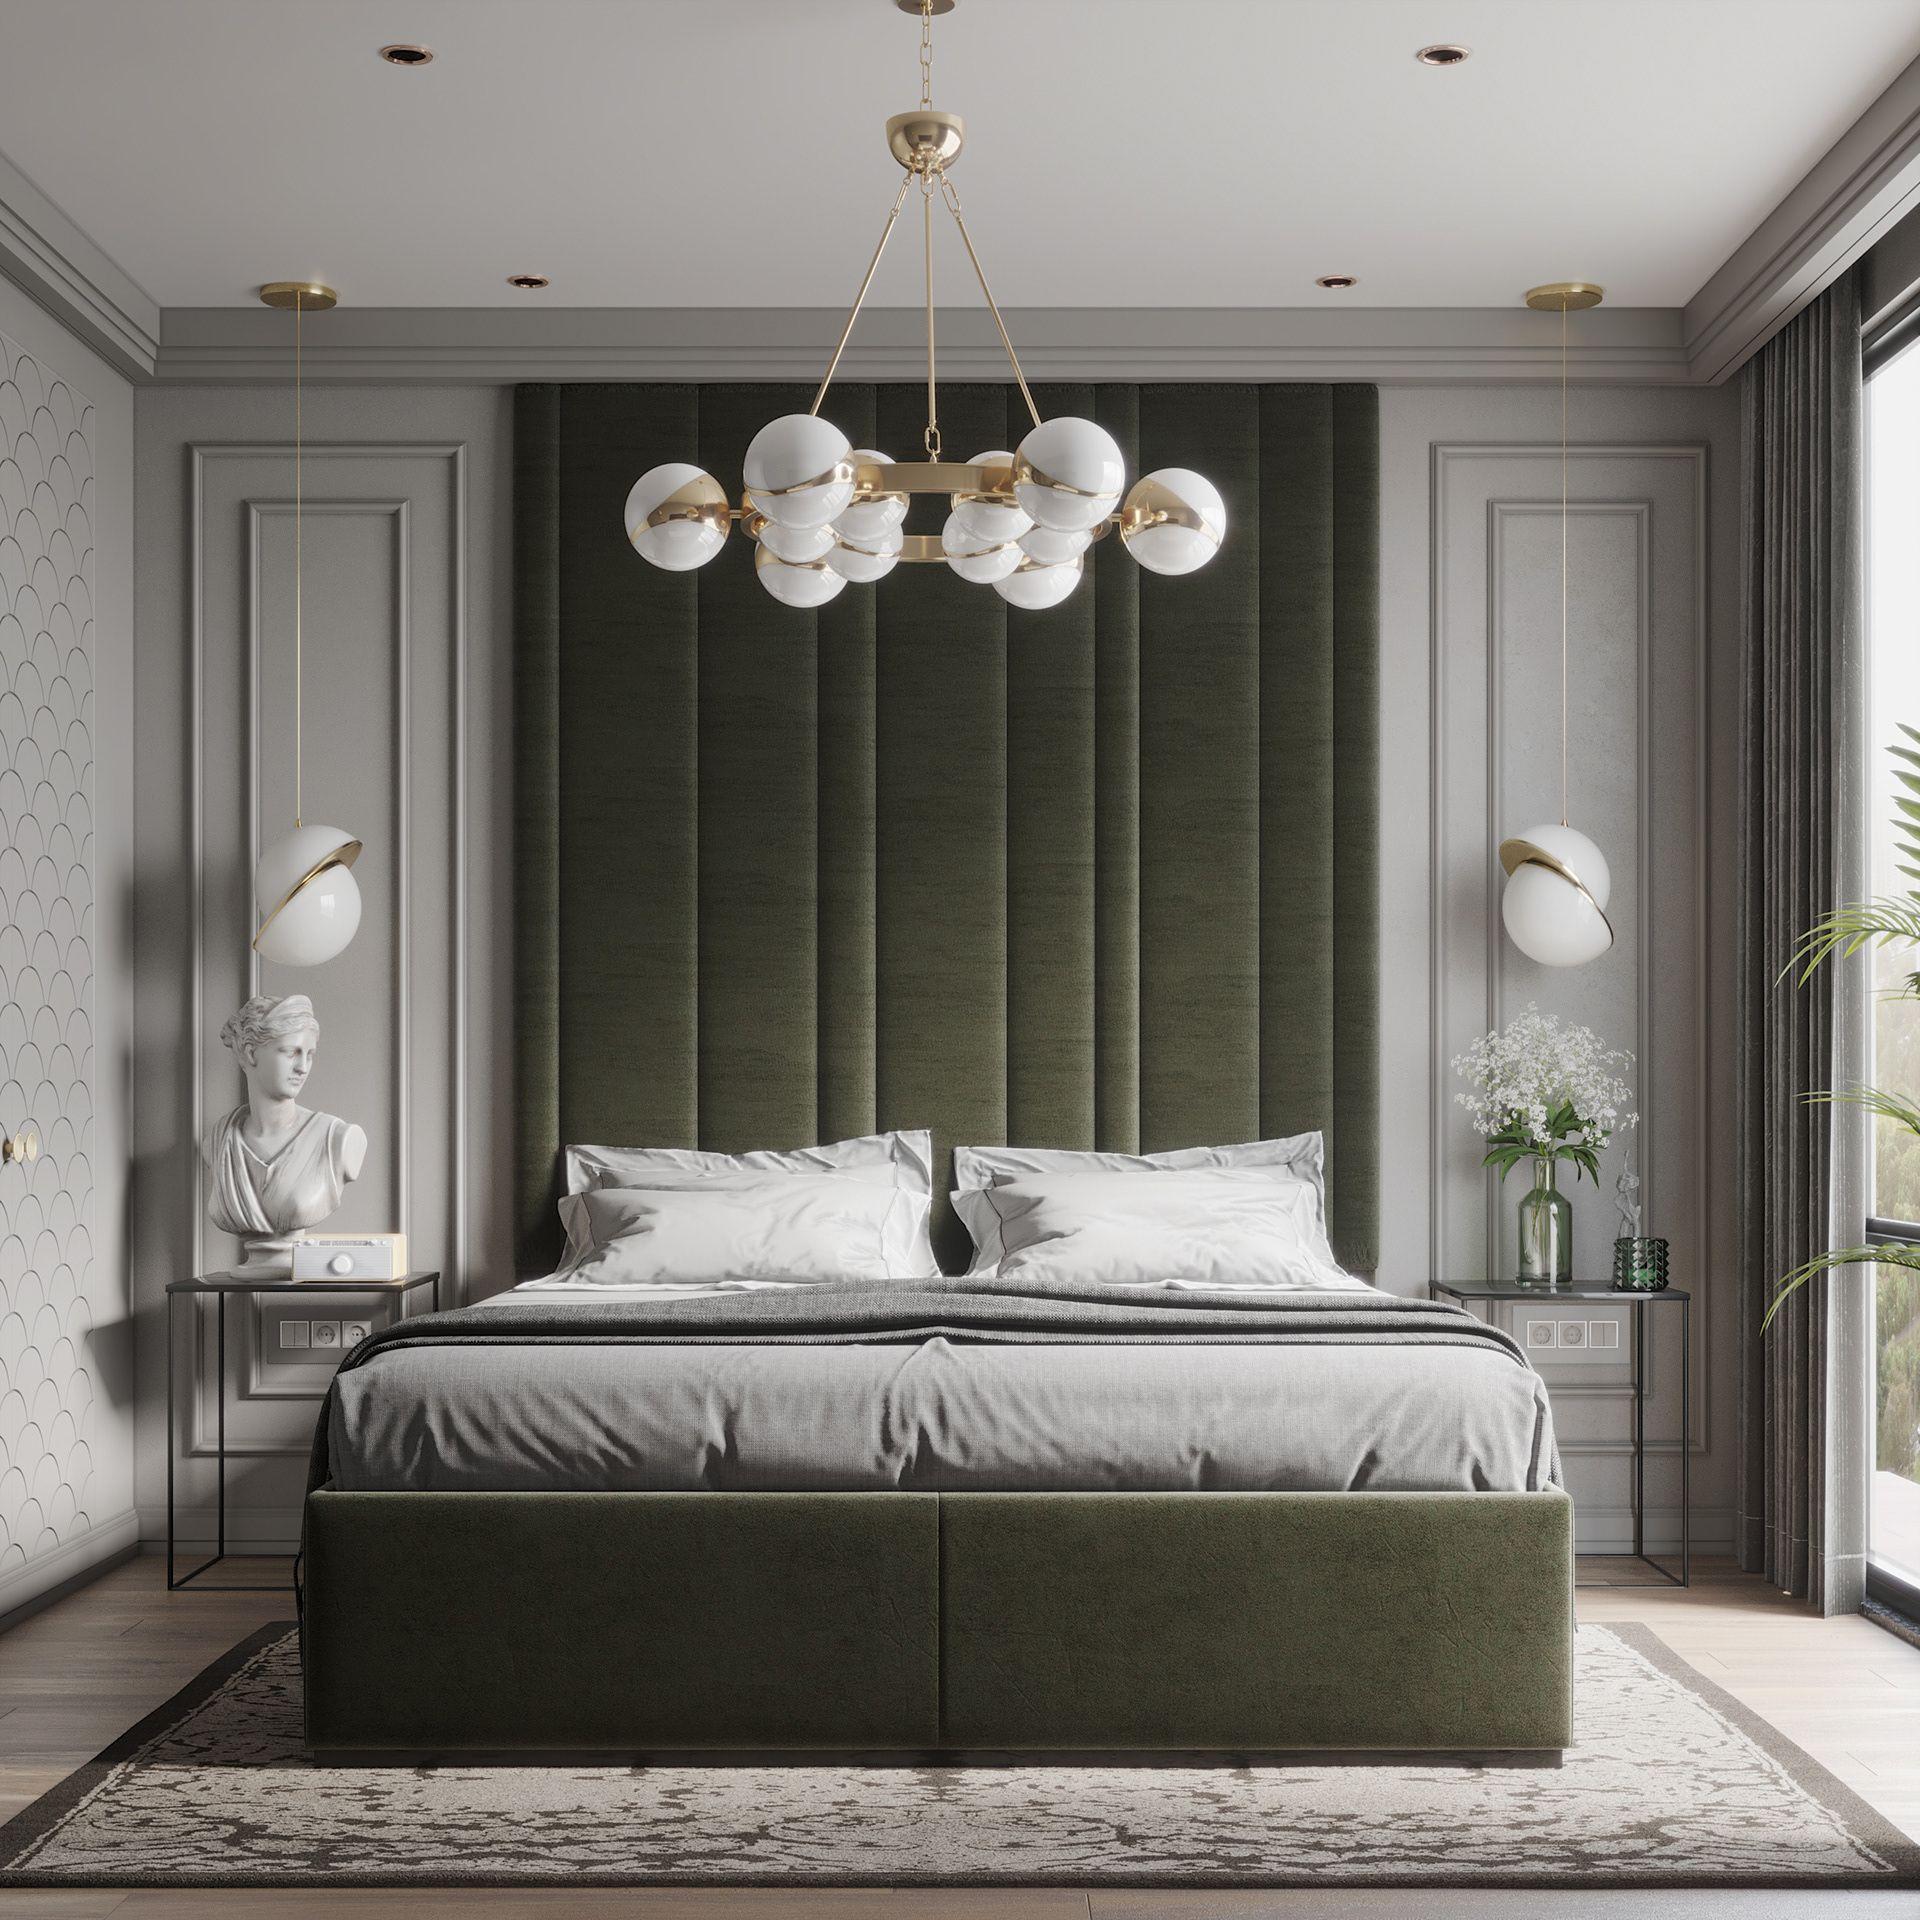 Simple Neoclassic Bedroom On Behance Modern Luxury Bedroom Modern Bedroom Interior Master Bedroom Interior Simple classic bedroom design